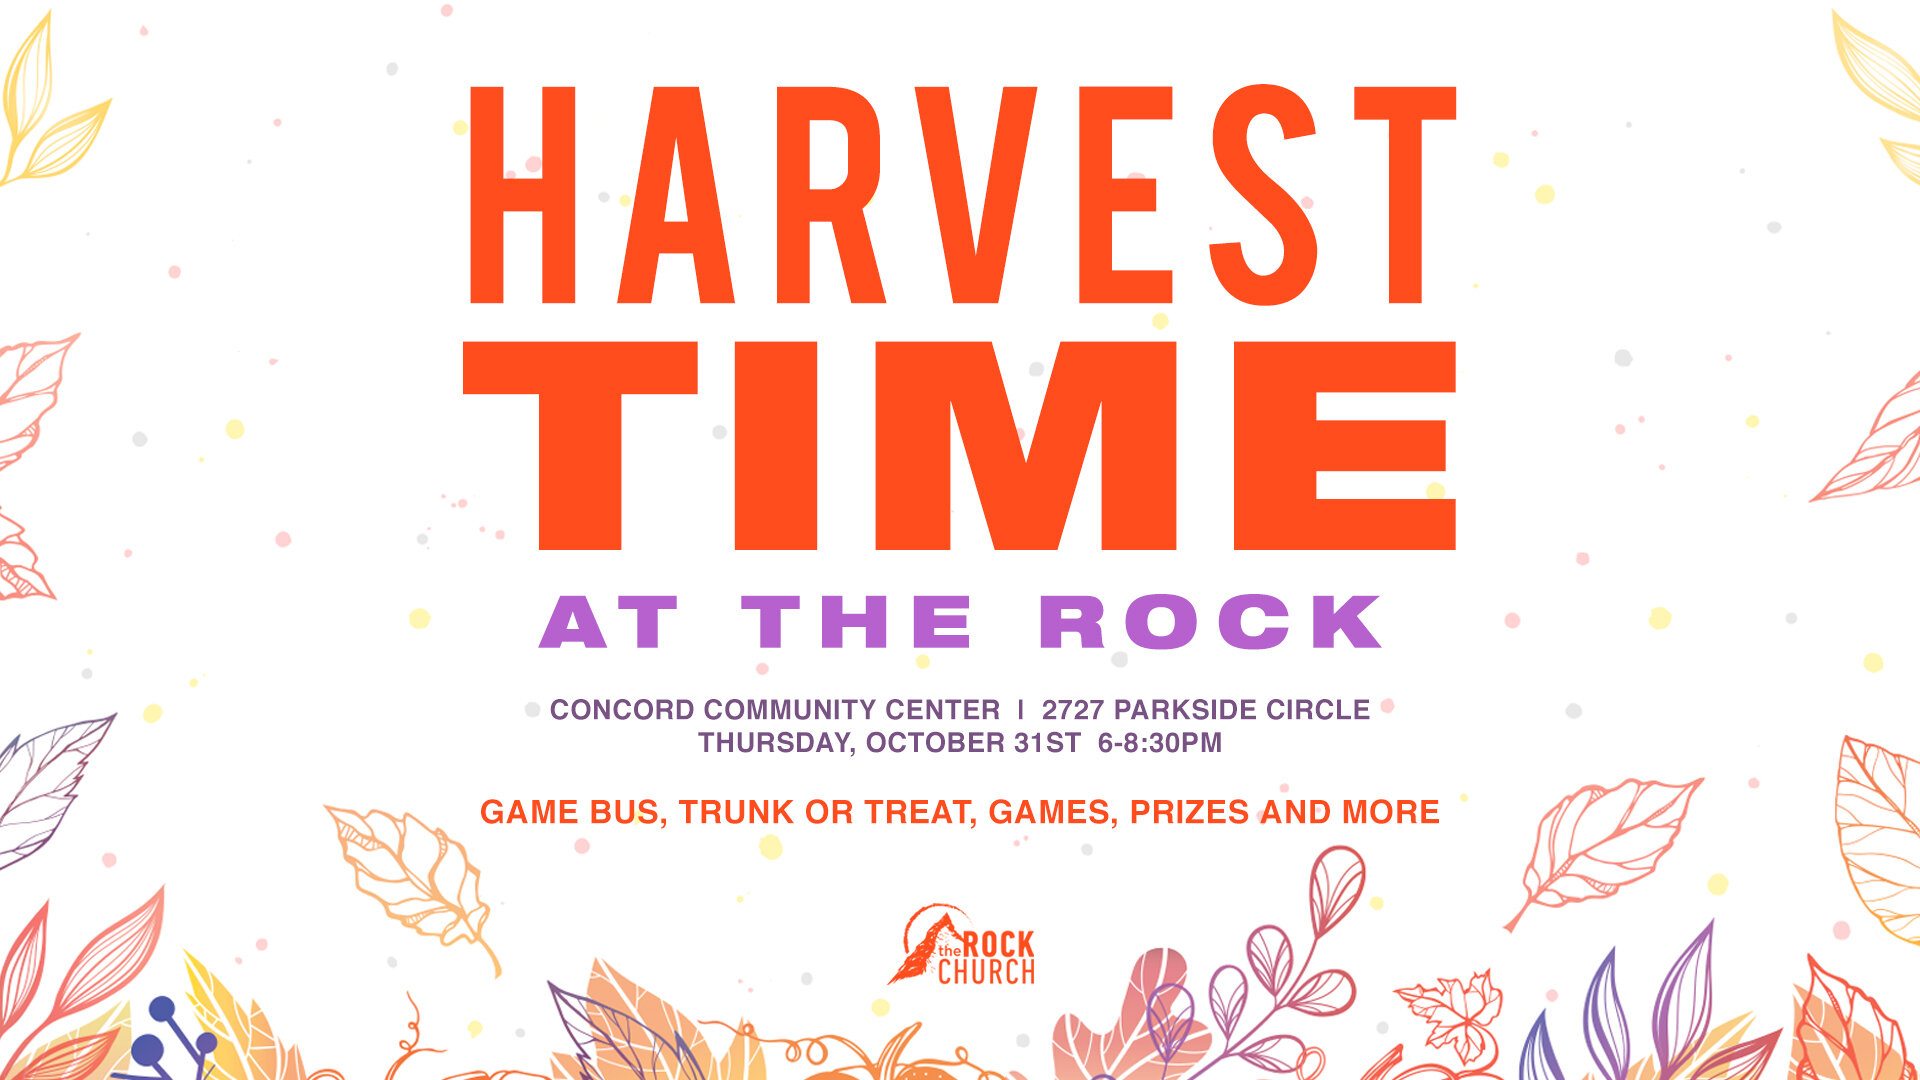 Harvest Time hd.jpg